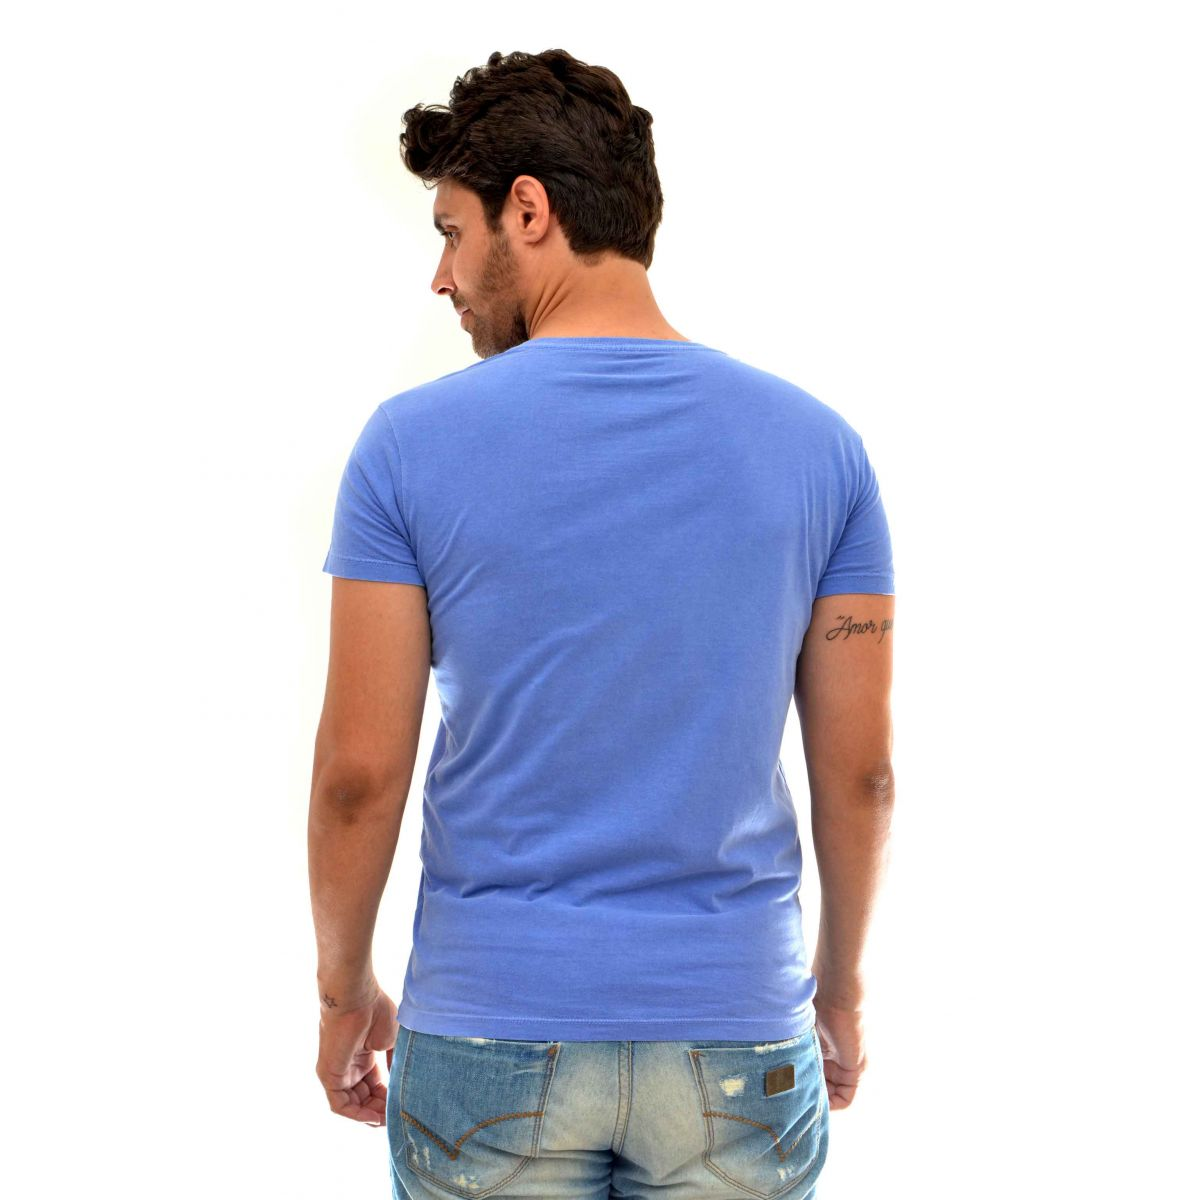 Camiseta Osklen Rj Azul  - Ca Brasileira